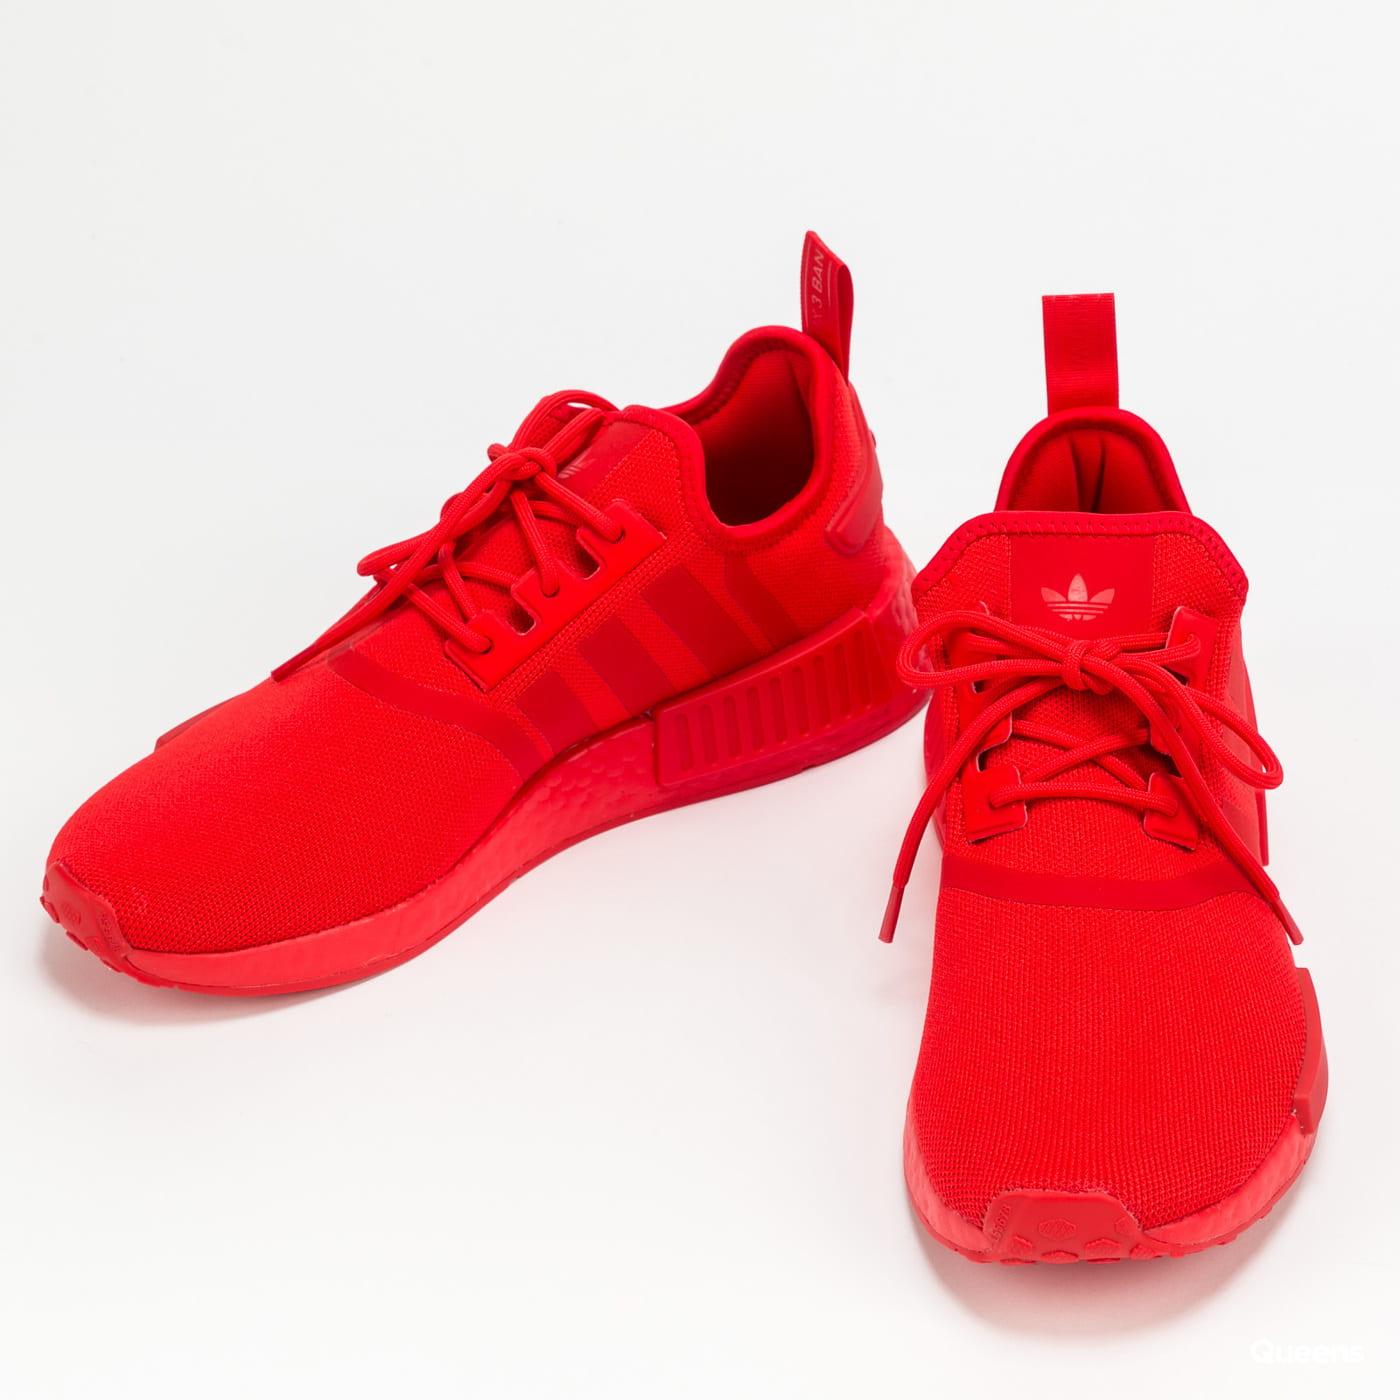 adidas Originals NMD_R1 Primablue vivred / vivred / vivred